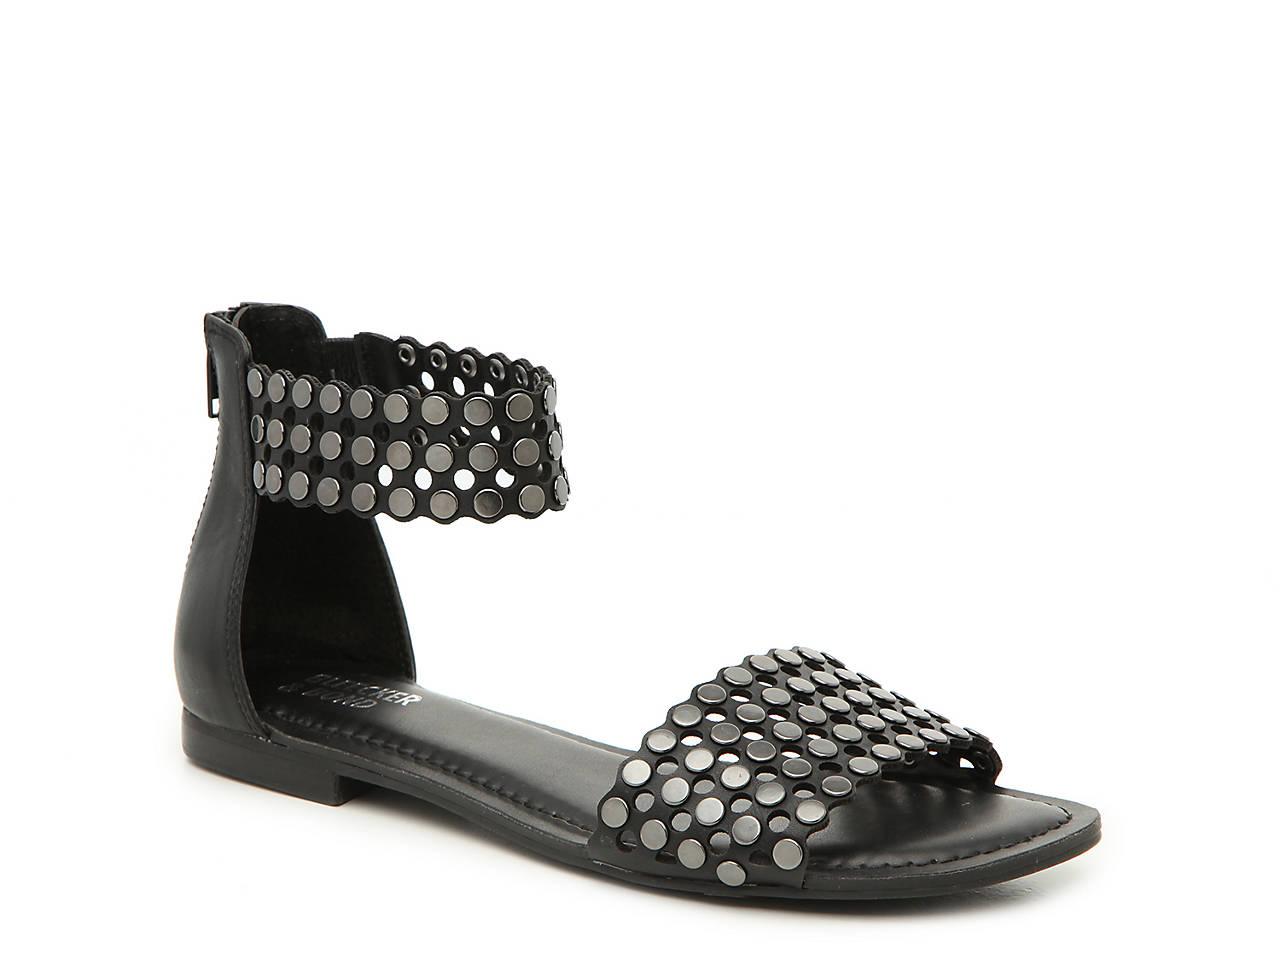 a3c15f4c1 Bleecker   Bond Sandrine Sandal Women s Shoes